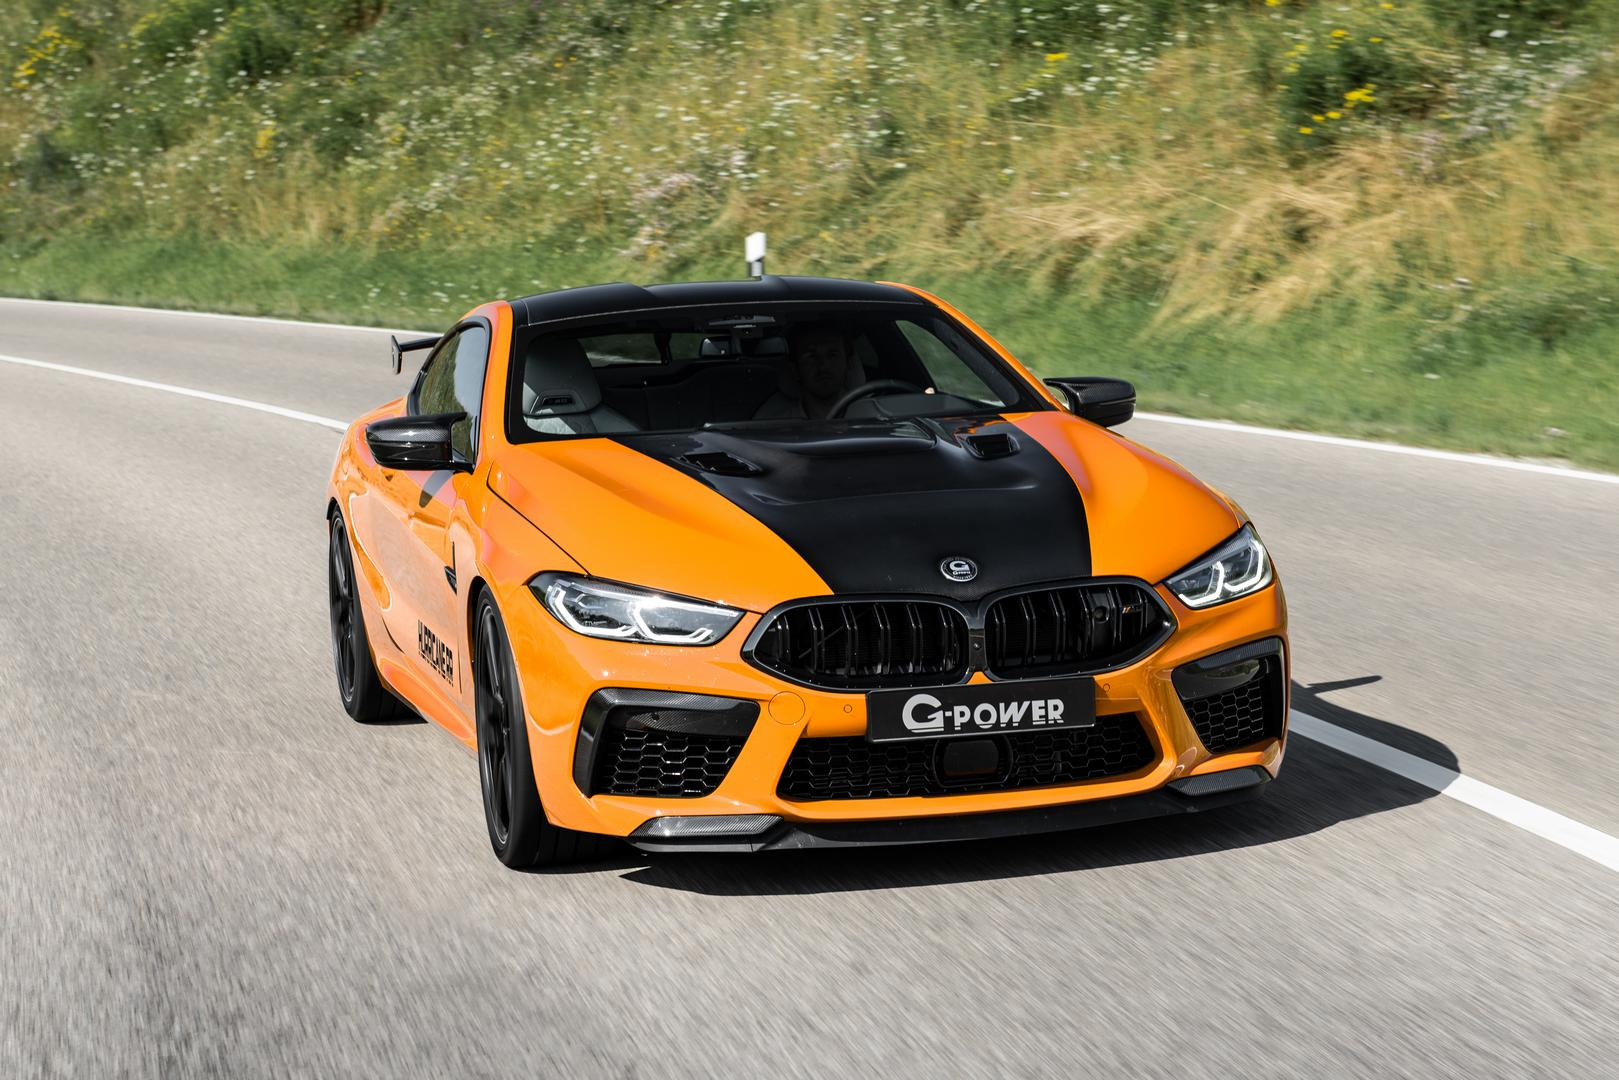 G-Power BMW M8 Hurricane RR specs